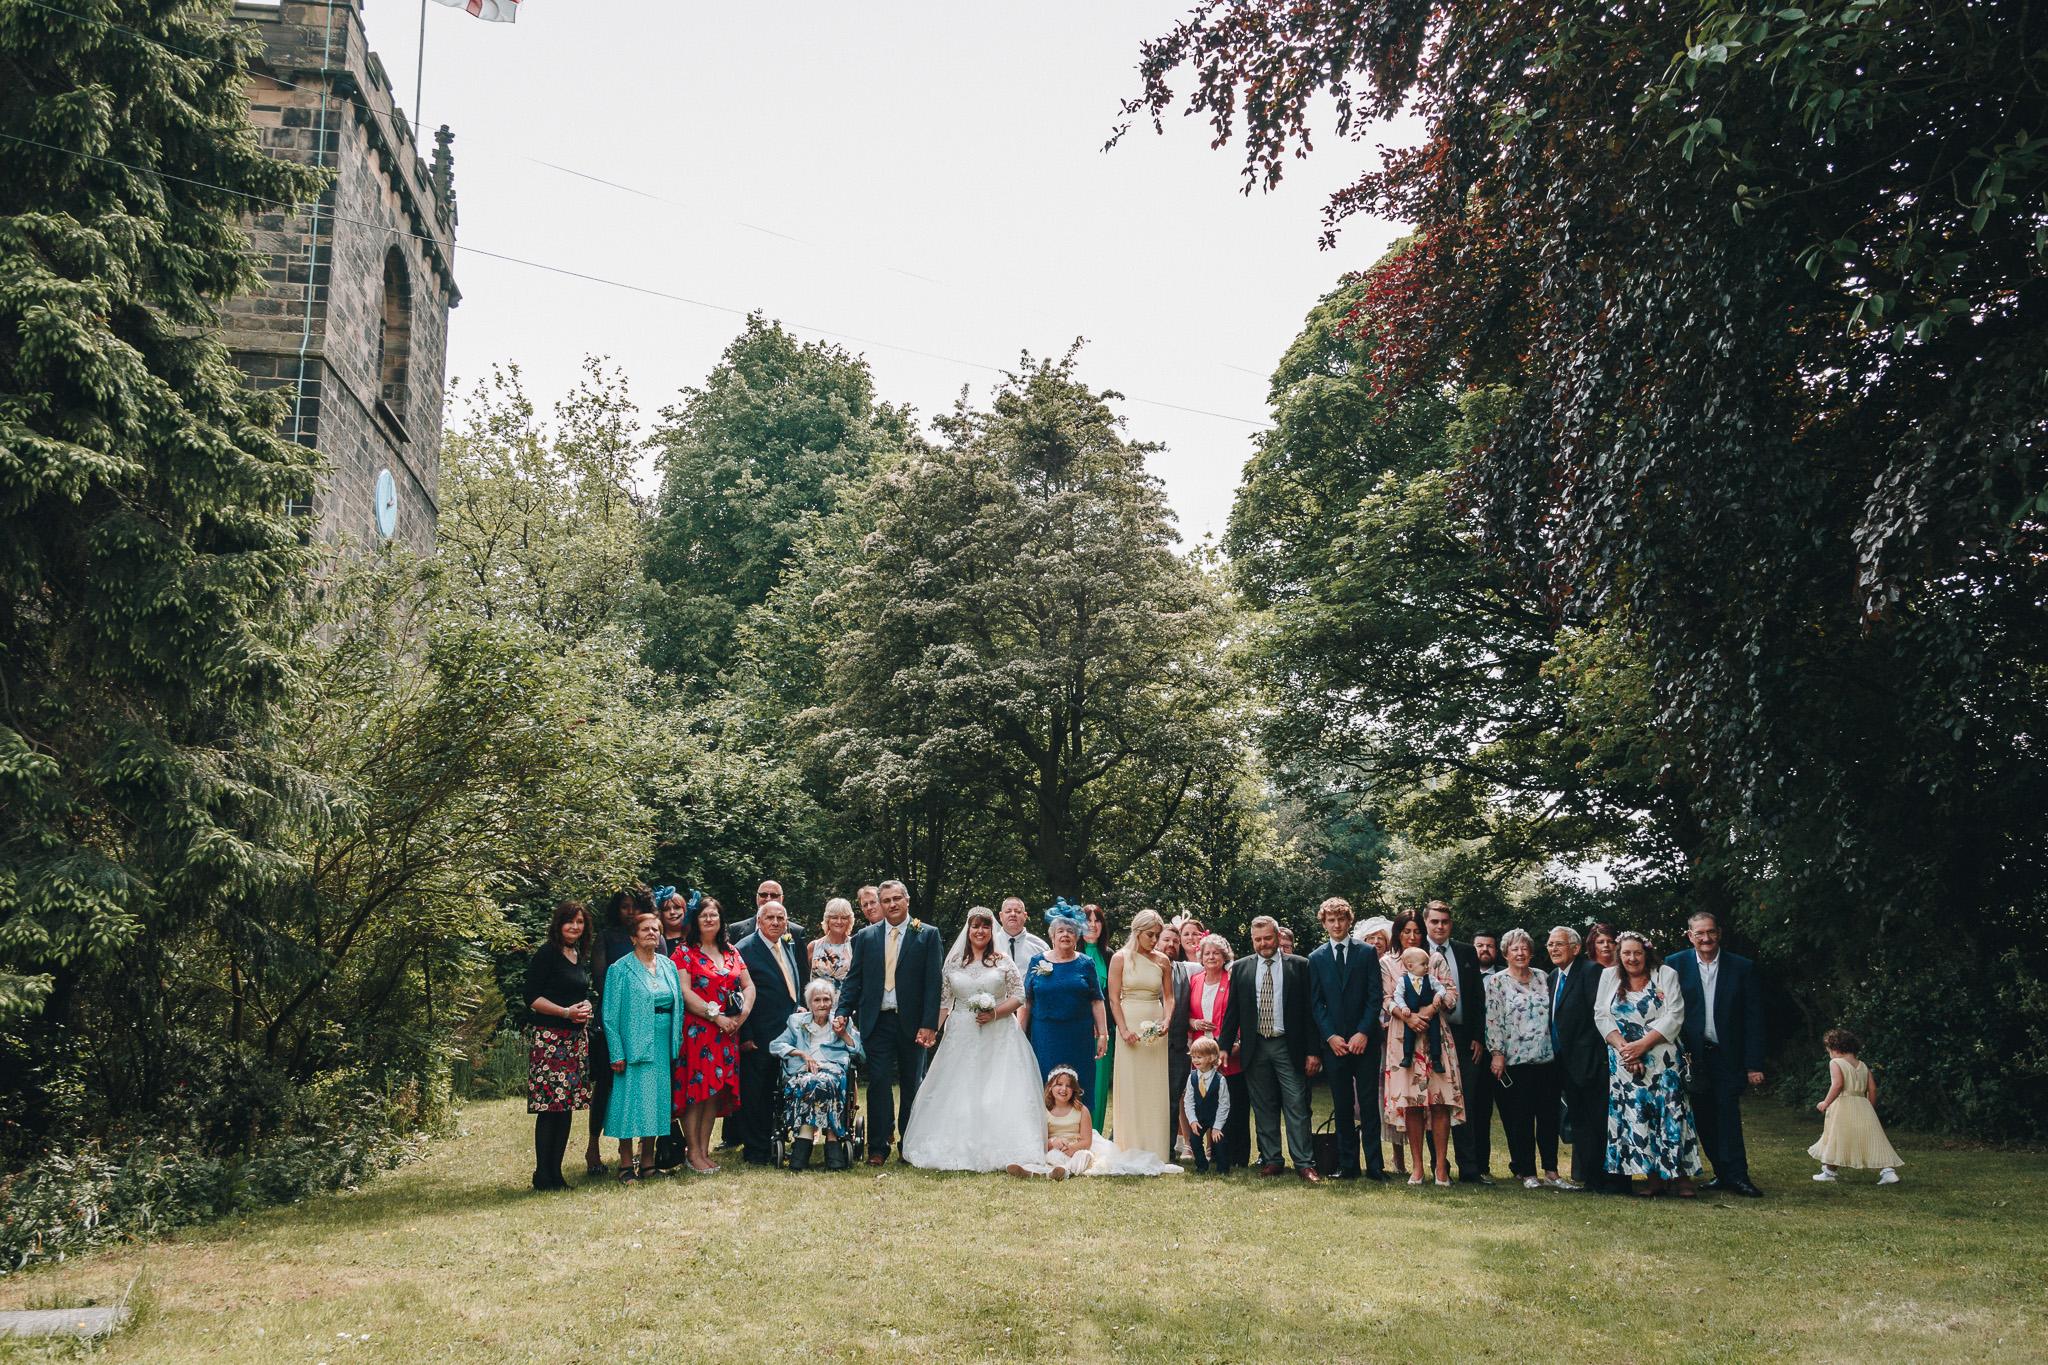 Nat and Sergio Wedding Photos - Website Quality_129.jpg